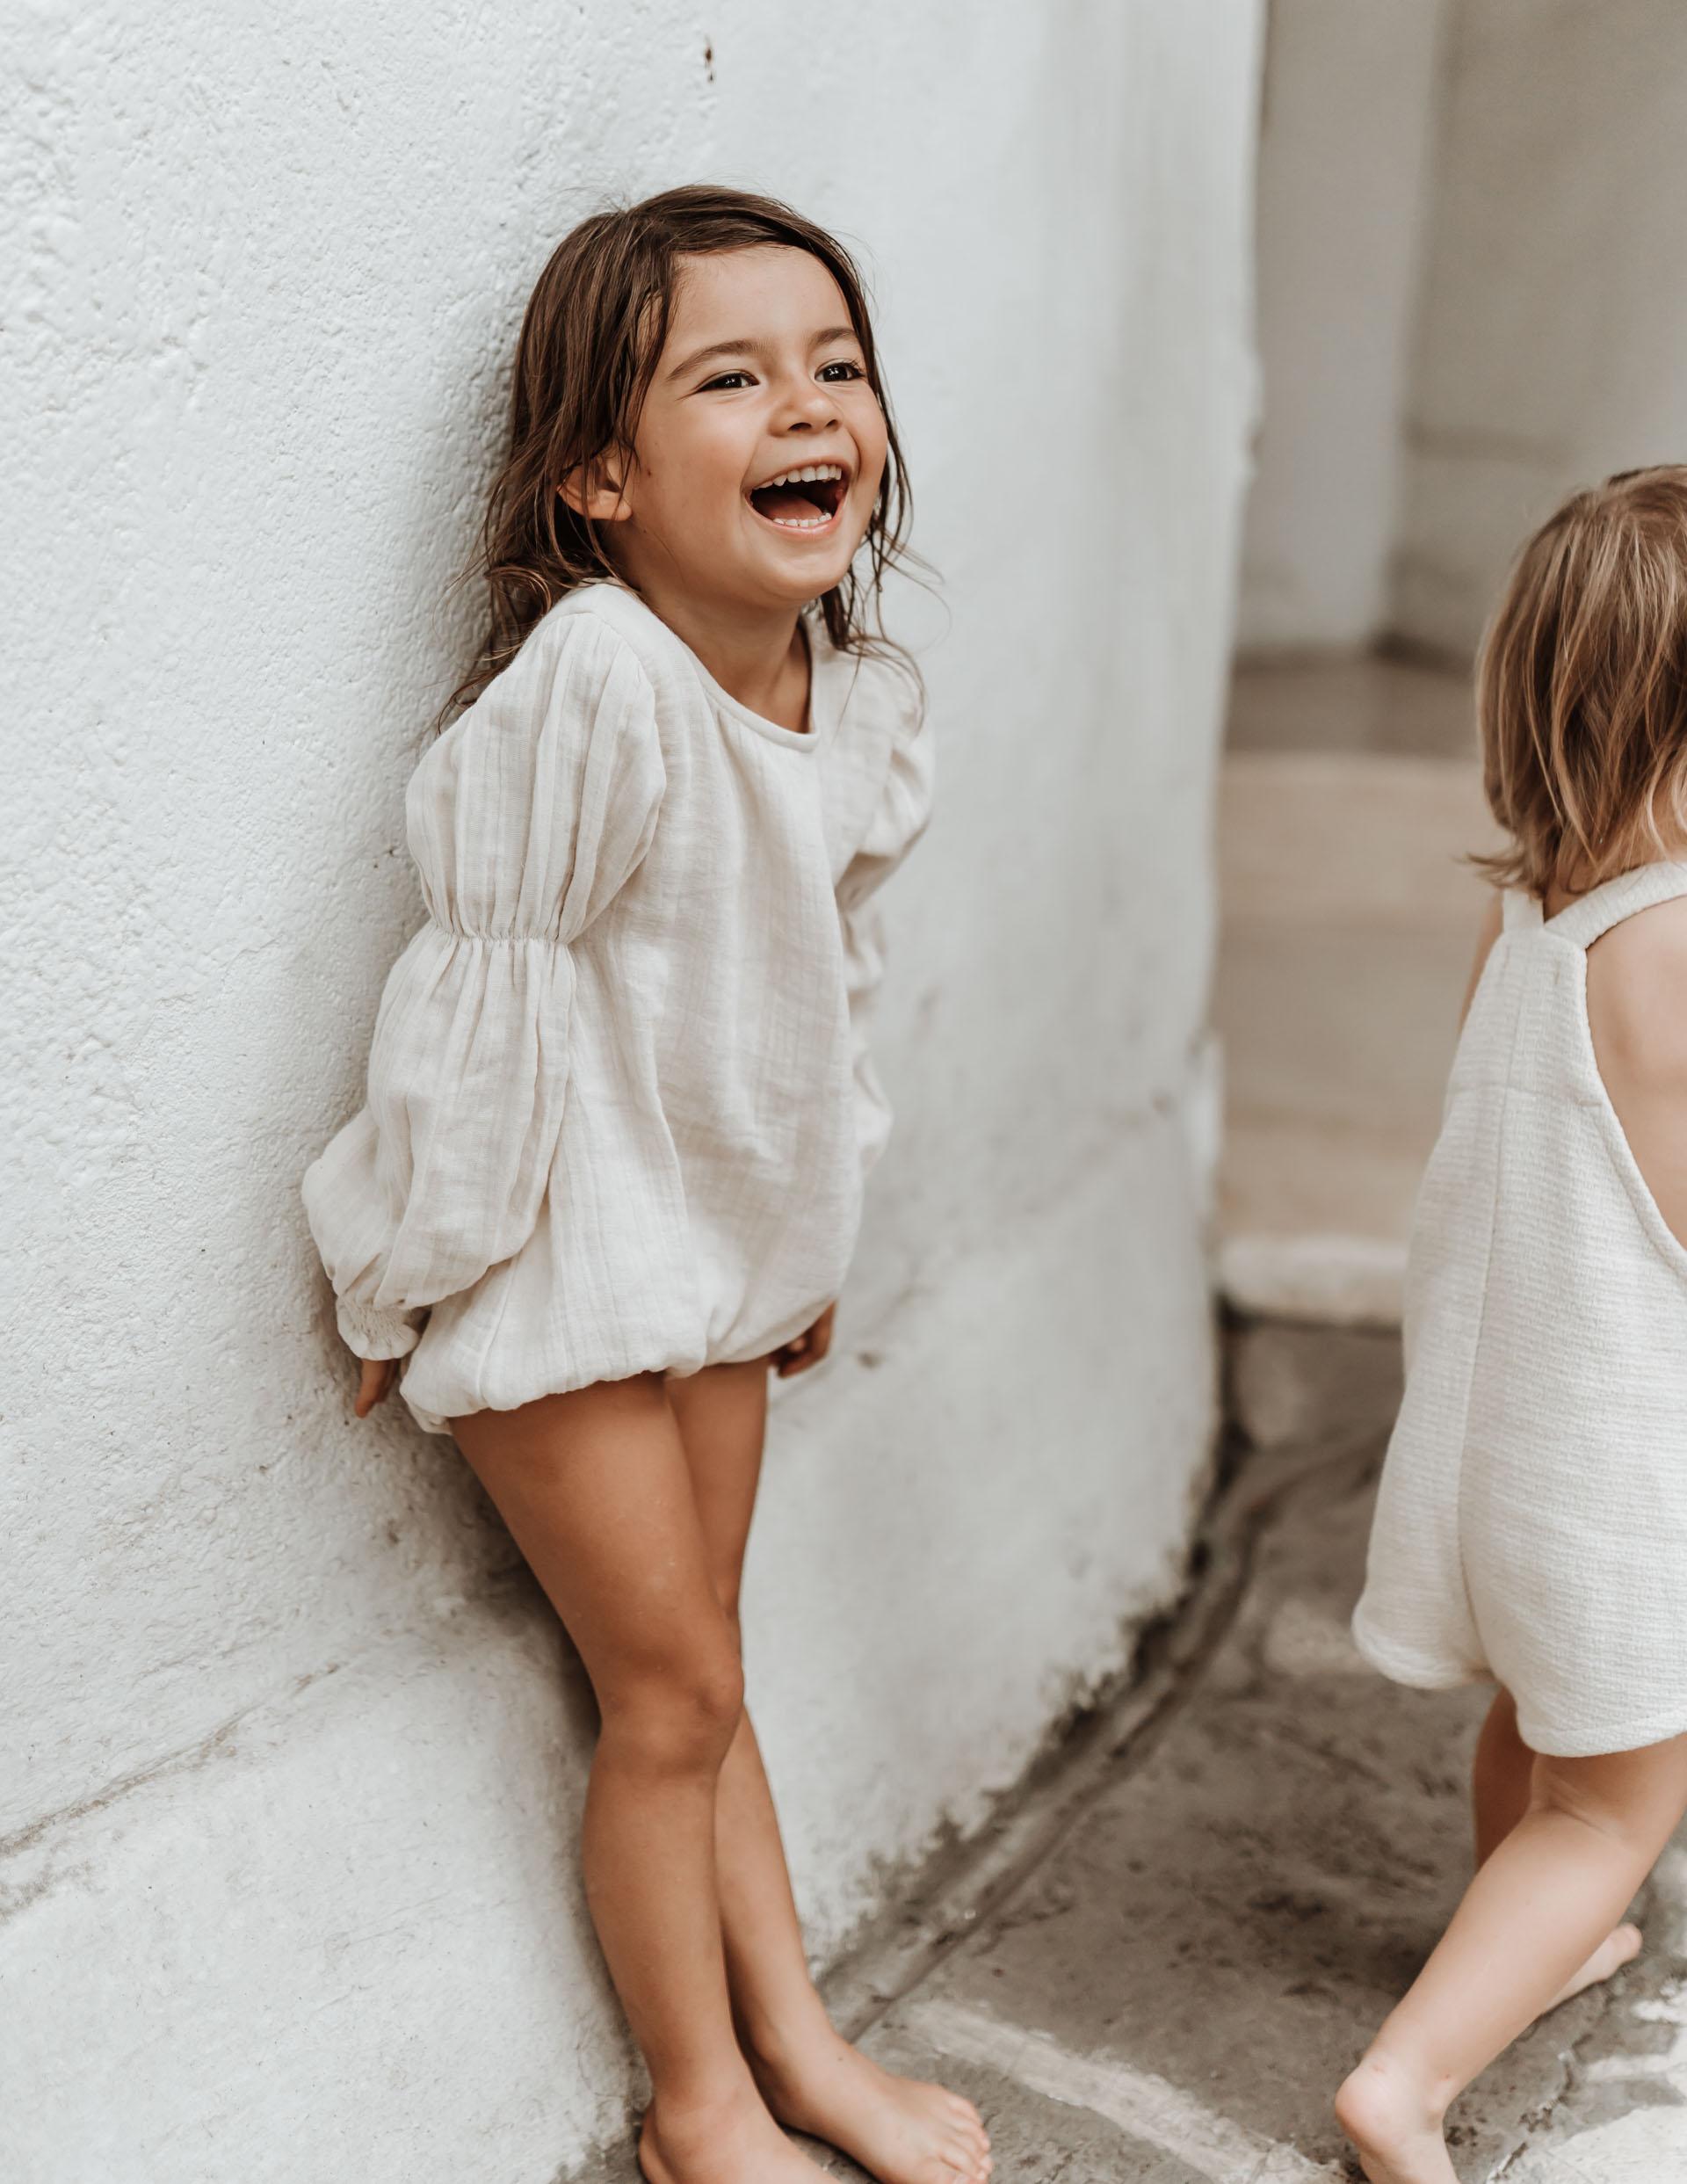 keira-mason-illoura-the-label-cute-girl-laughing.jpg